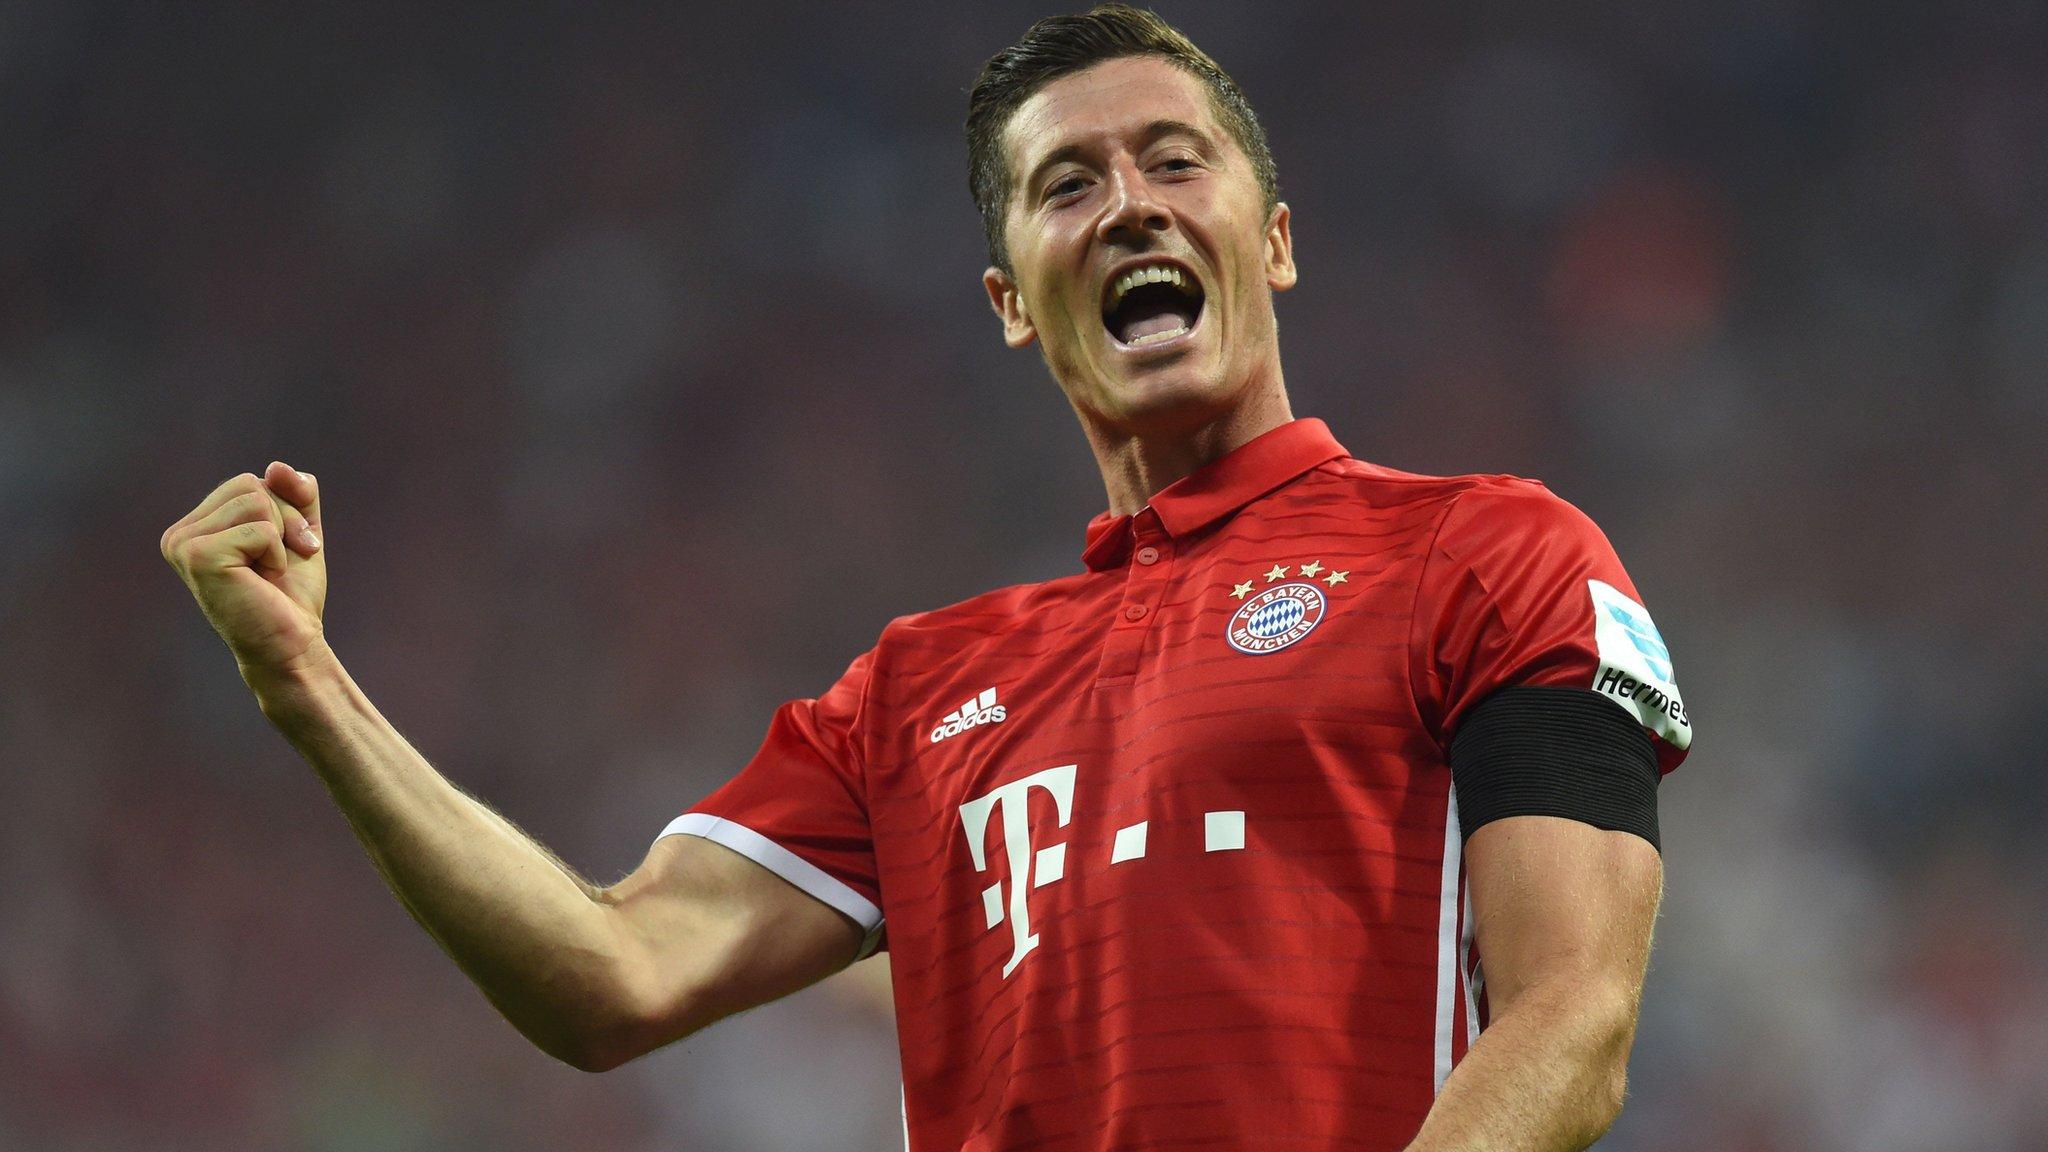 Lewandowski hits hat-trick as Bayern start league season in style